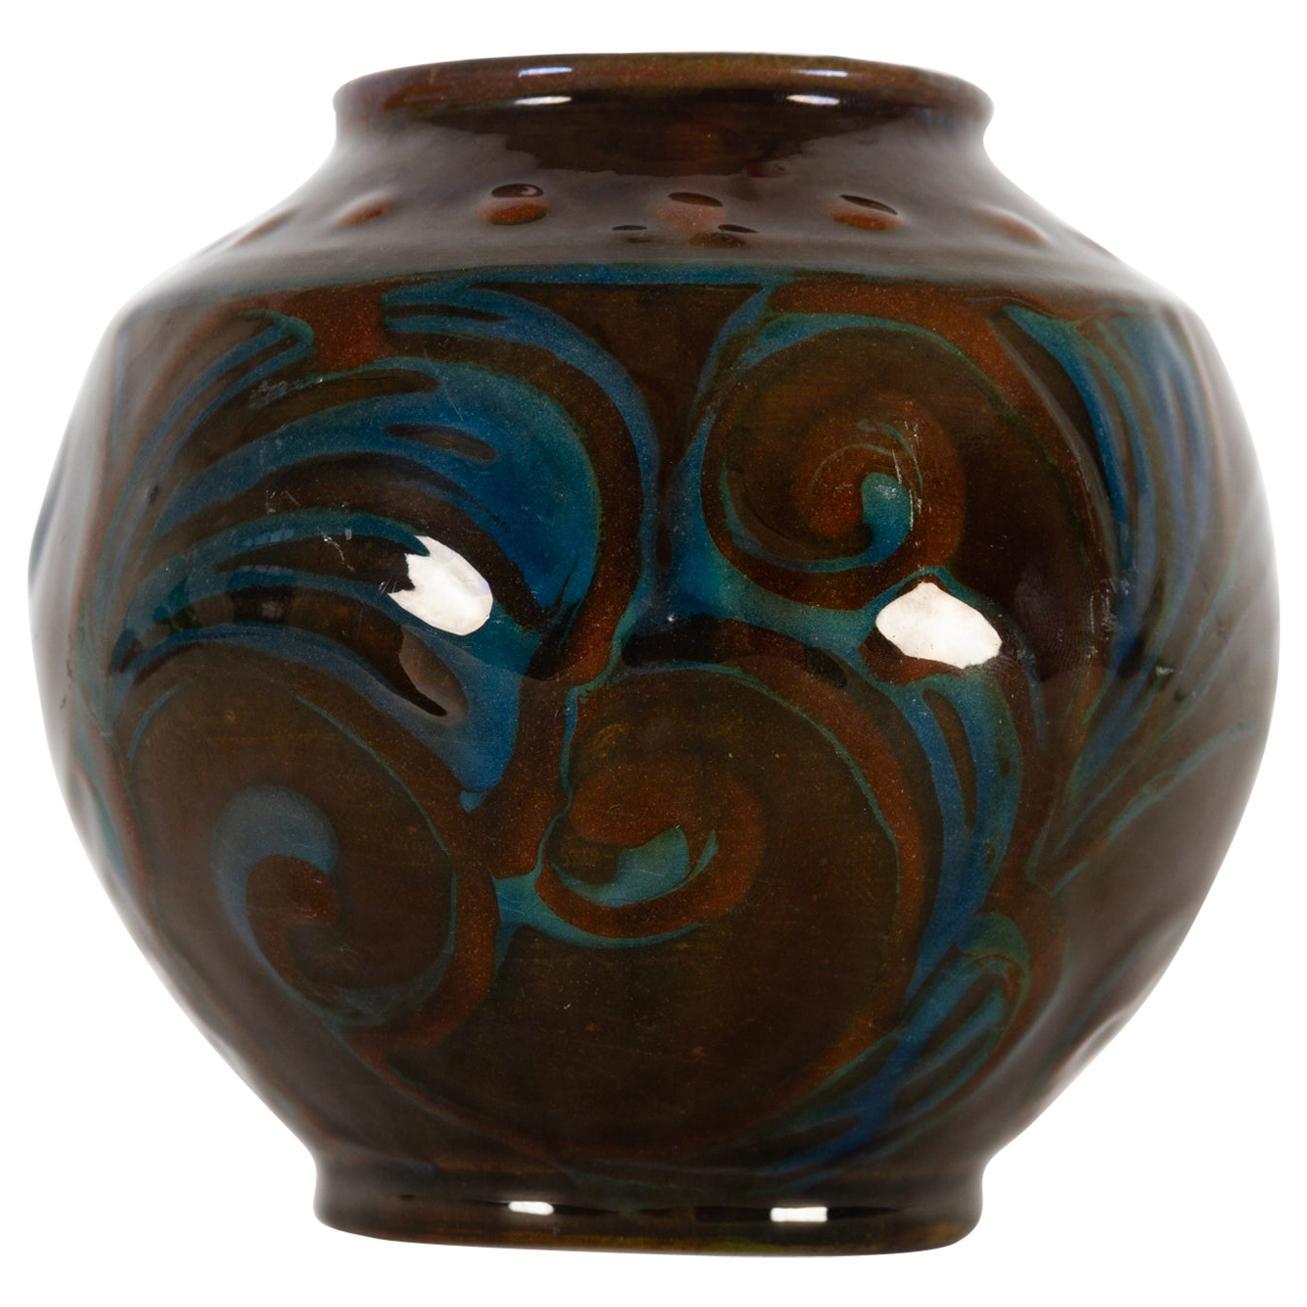 Vintage Danish Ceramic Vase by Herman A. Kähler, 1930s